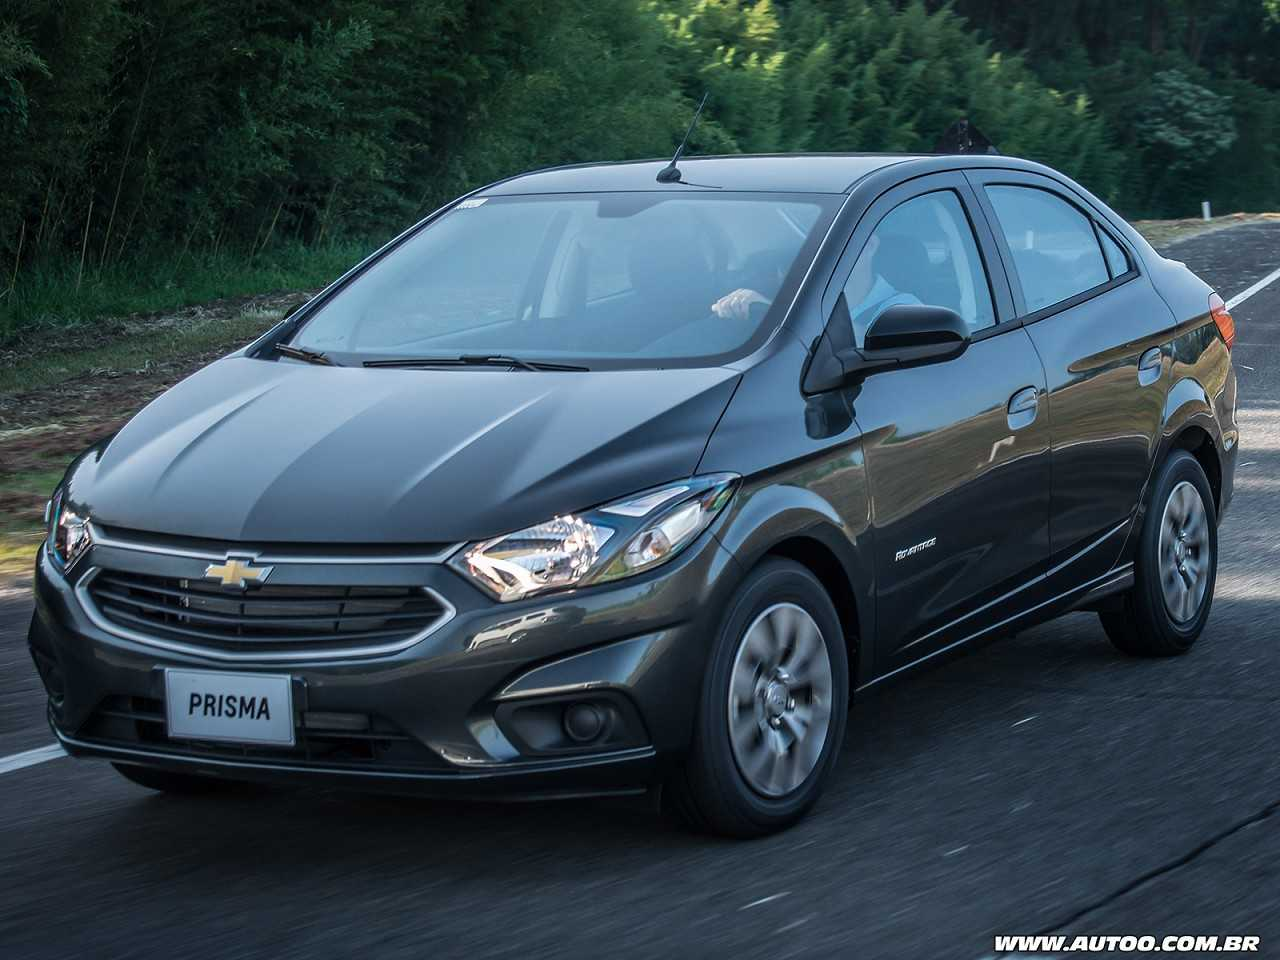 ChevroletPrisma 2018 - ângulo frontal